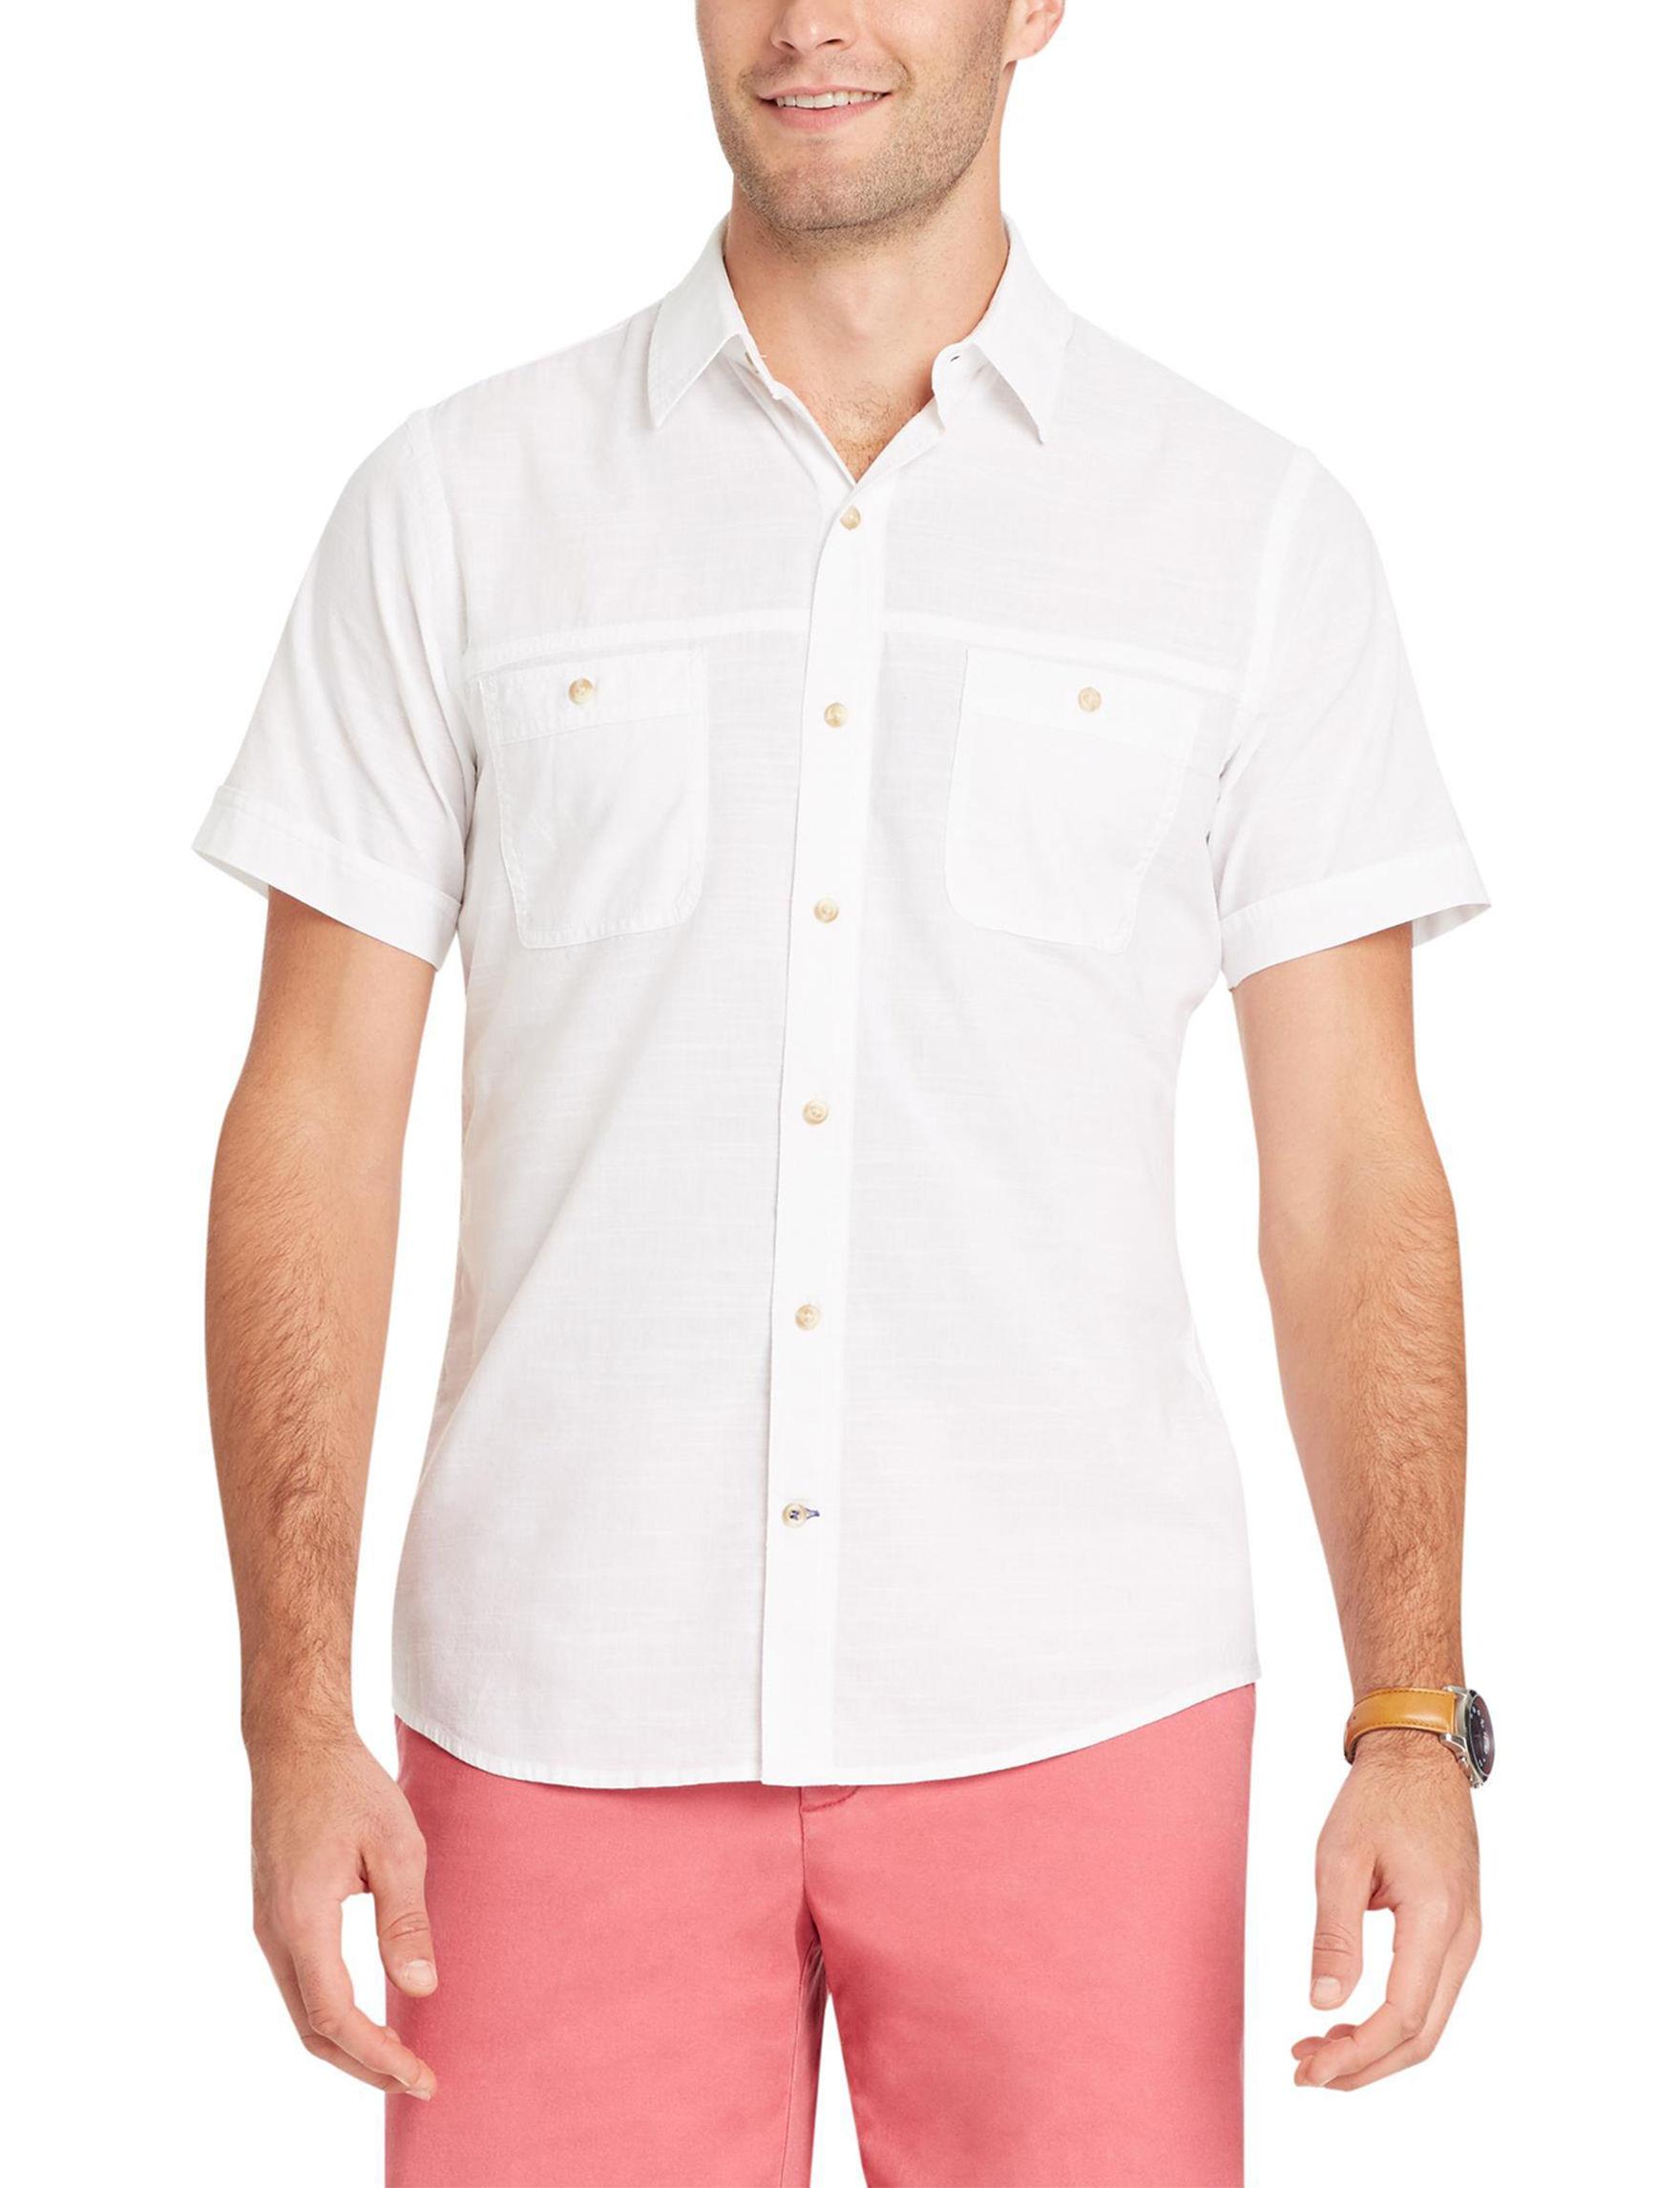 Izod White Casual Button Down Shirts